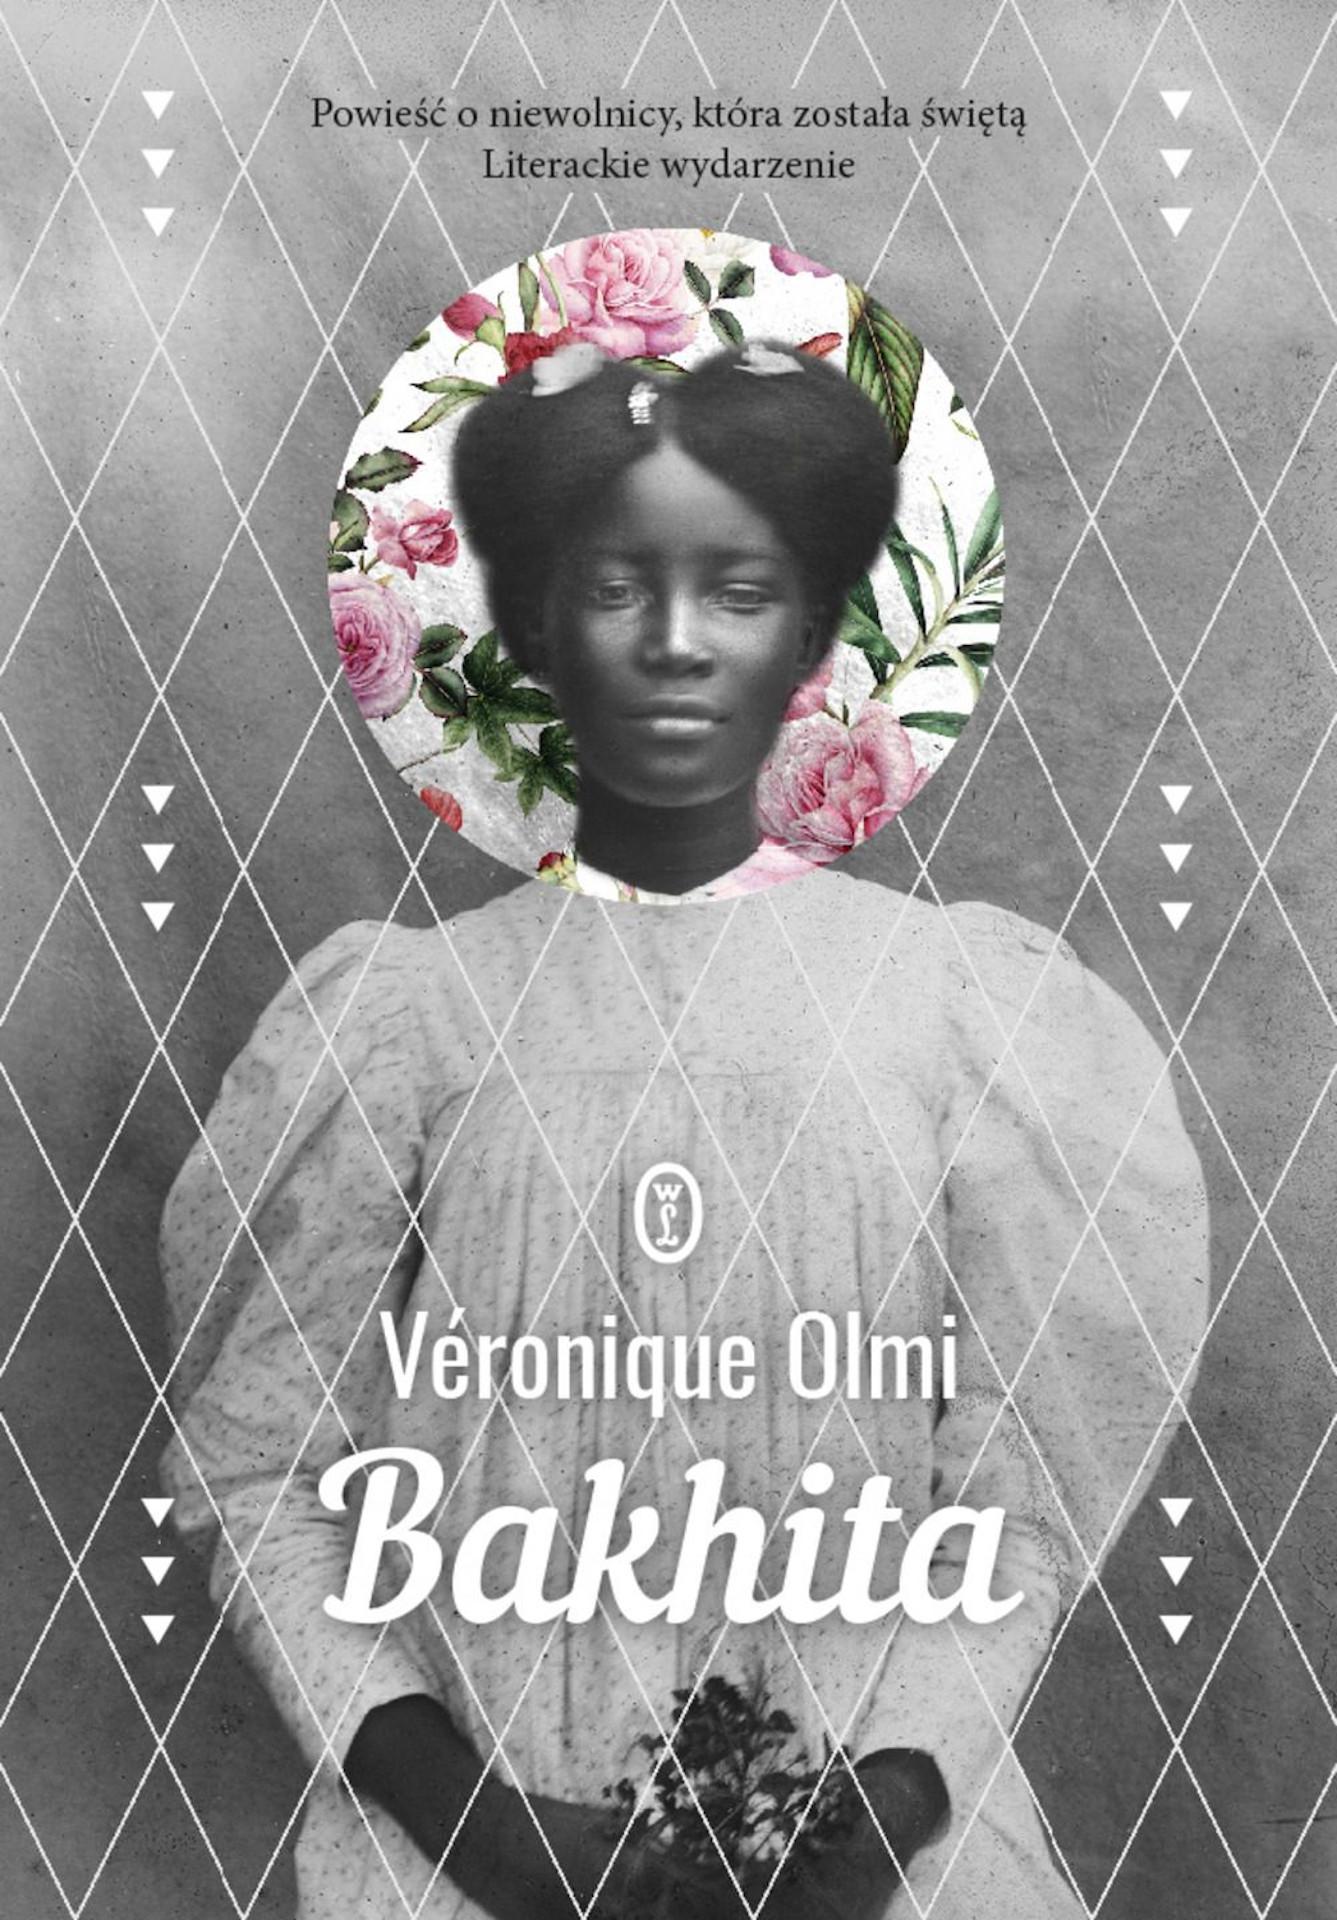 Veronique Olmi, Bakhita